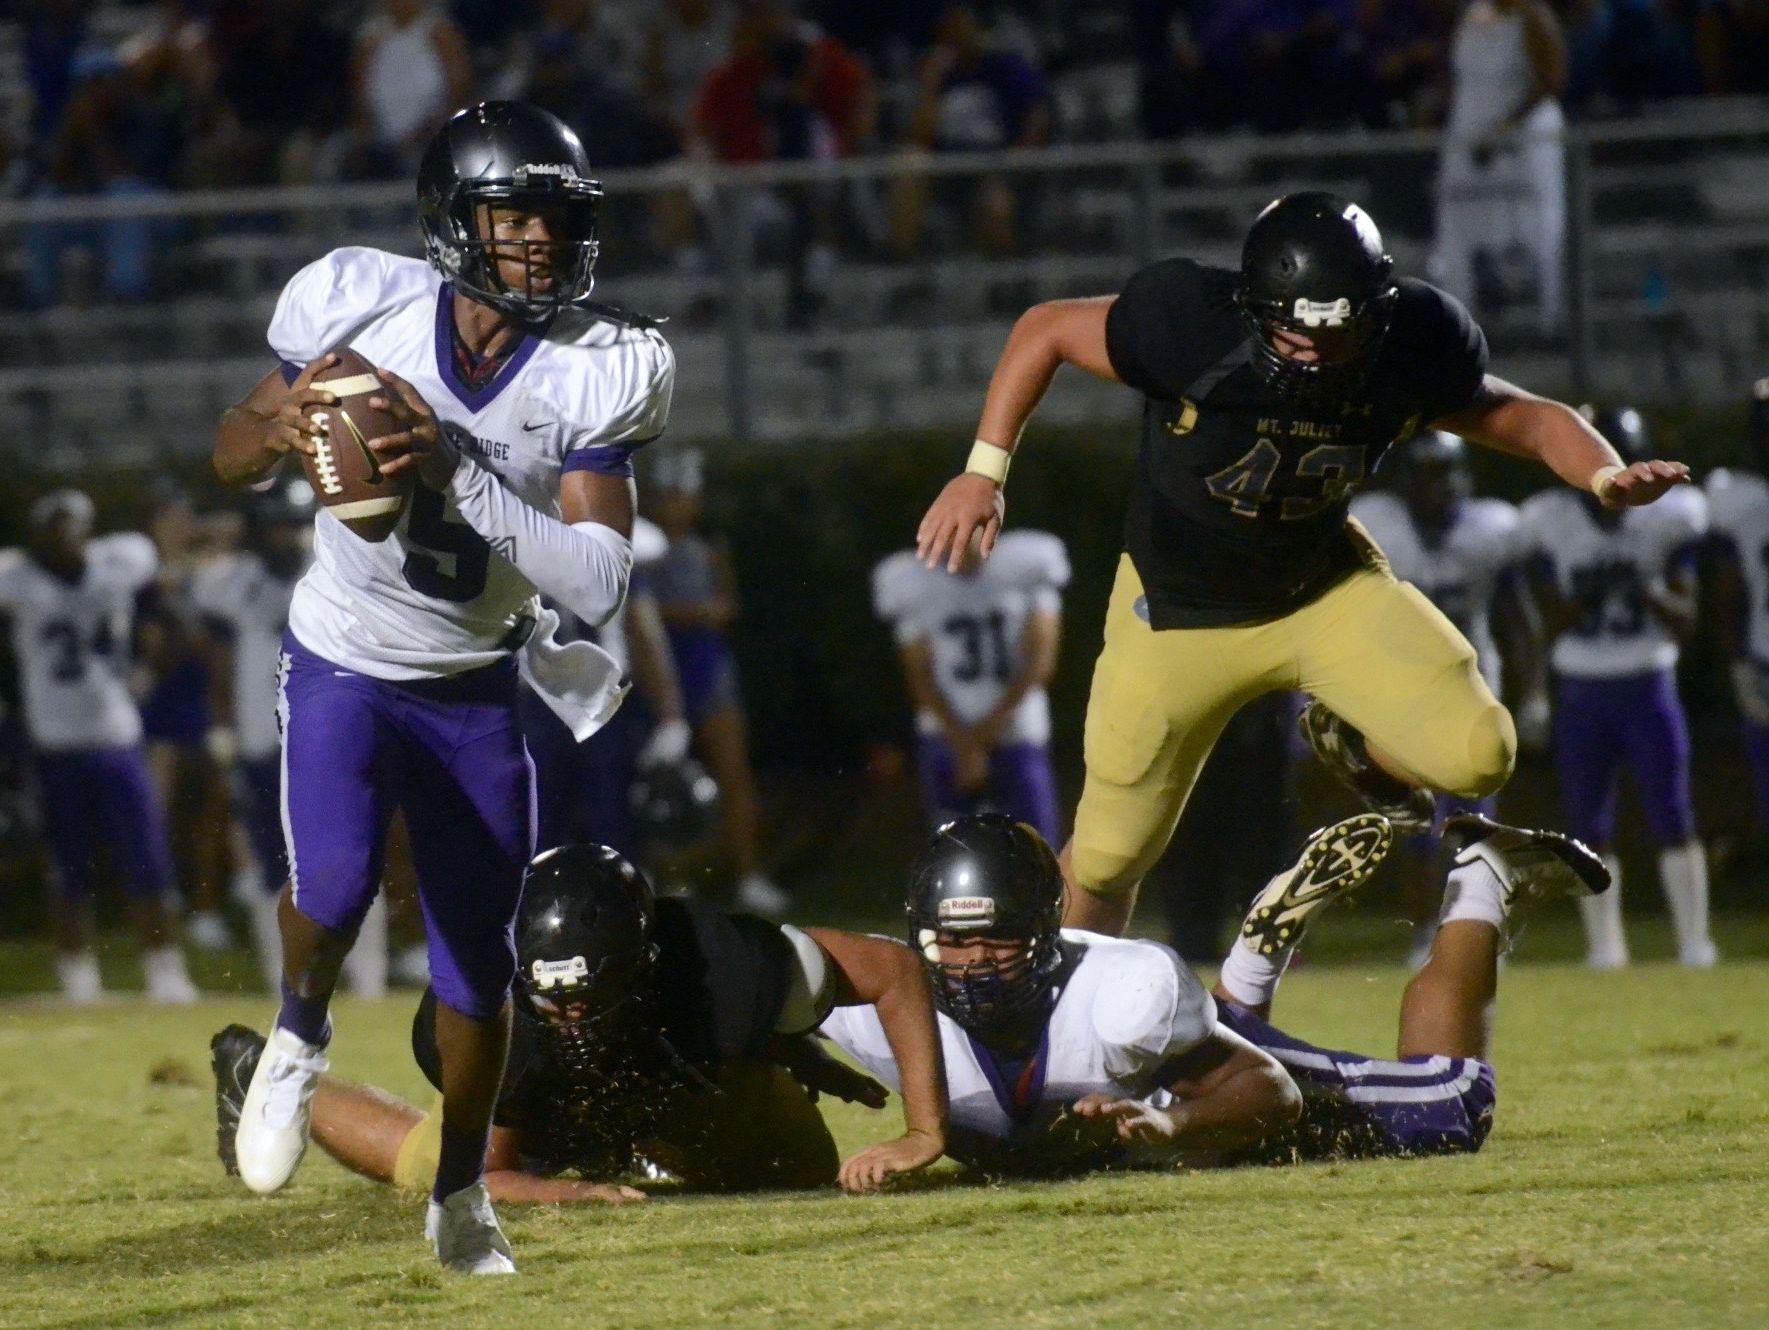 Cane Ridge quarterback D.J. Thorpe eludes the rush as Mt. Juliet's Jacob Shanks (43) pursues during the second quarter of Thursday's game.